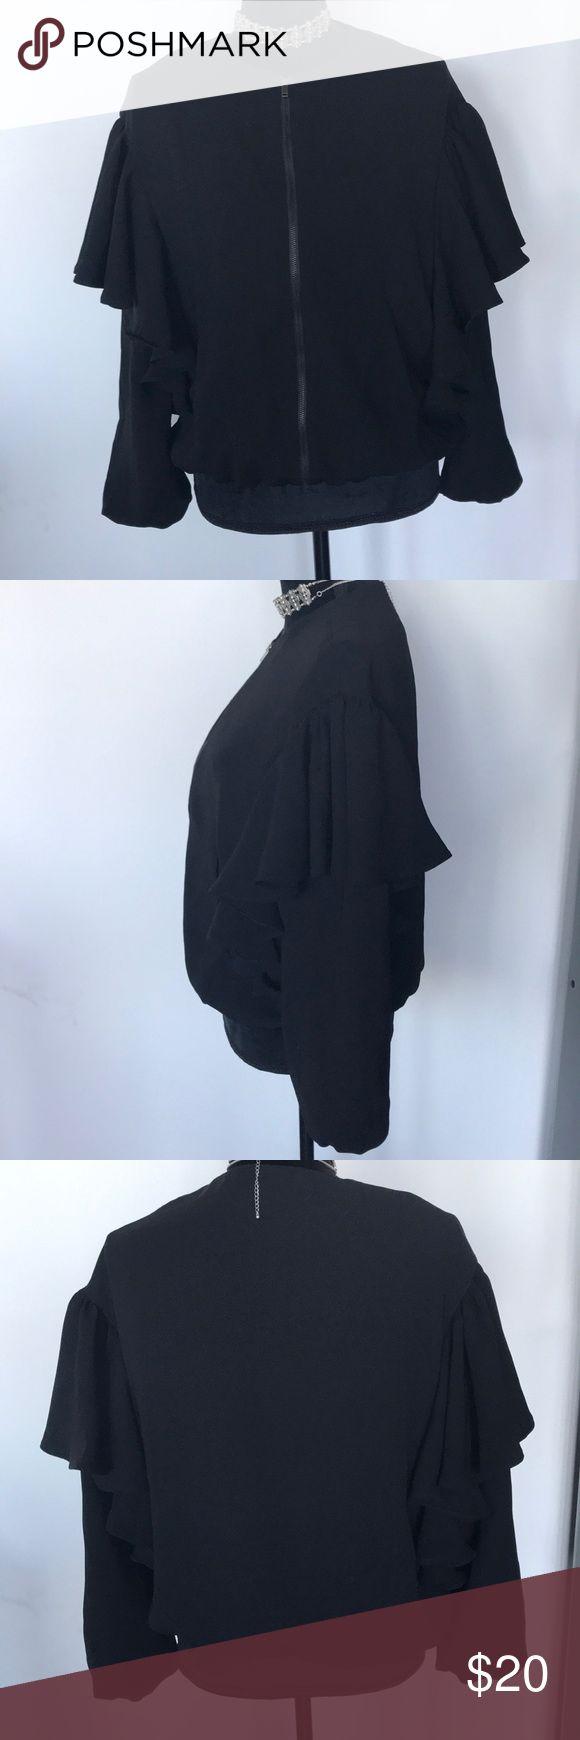 Zara Ruffle Jacket M I am selling a ruffle sleeve bomber style  jacket from Zara.  Size:M Zara Jackets & Coats